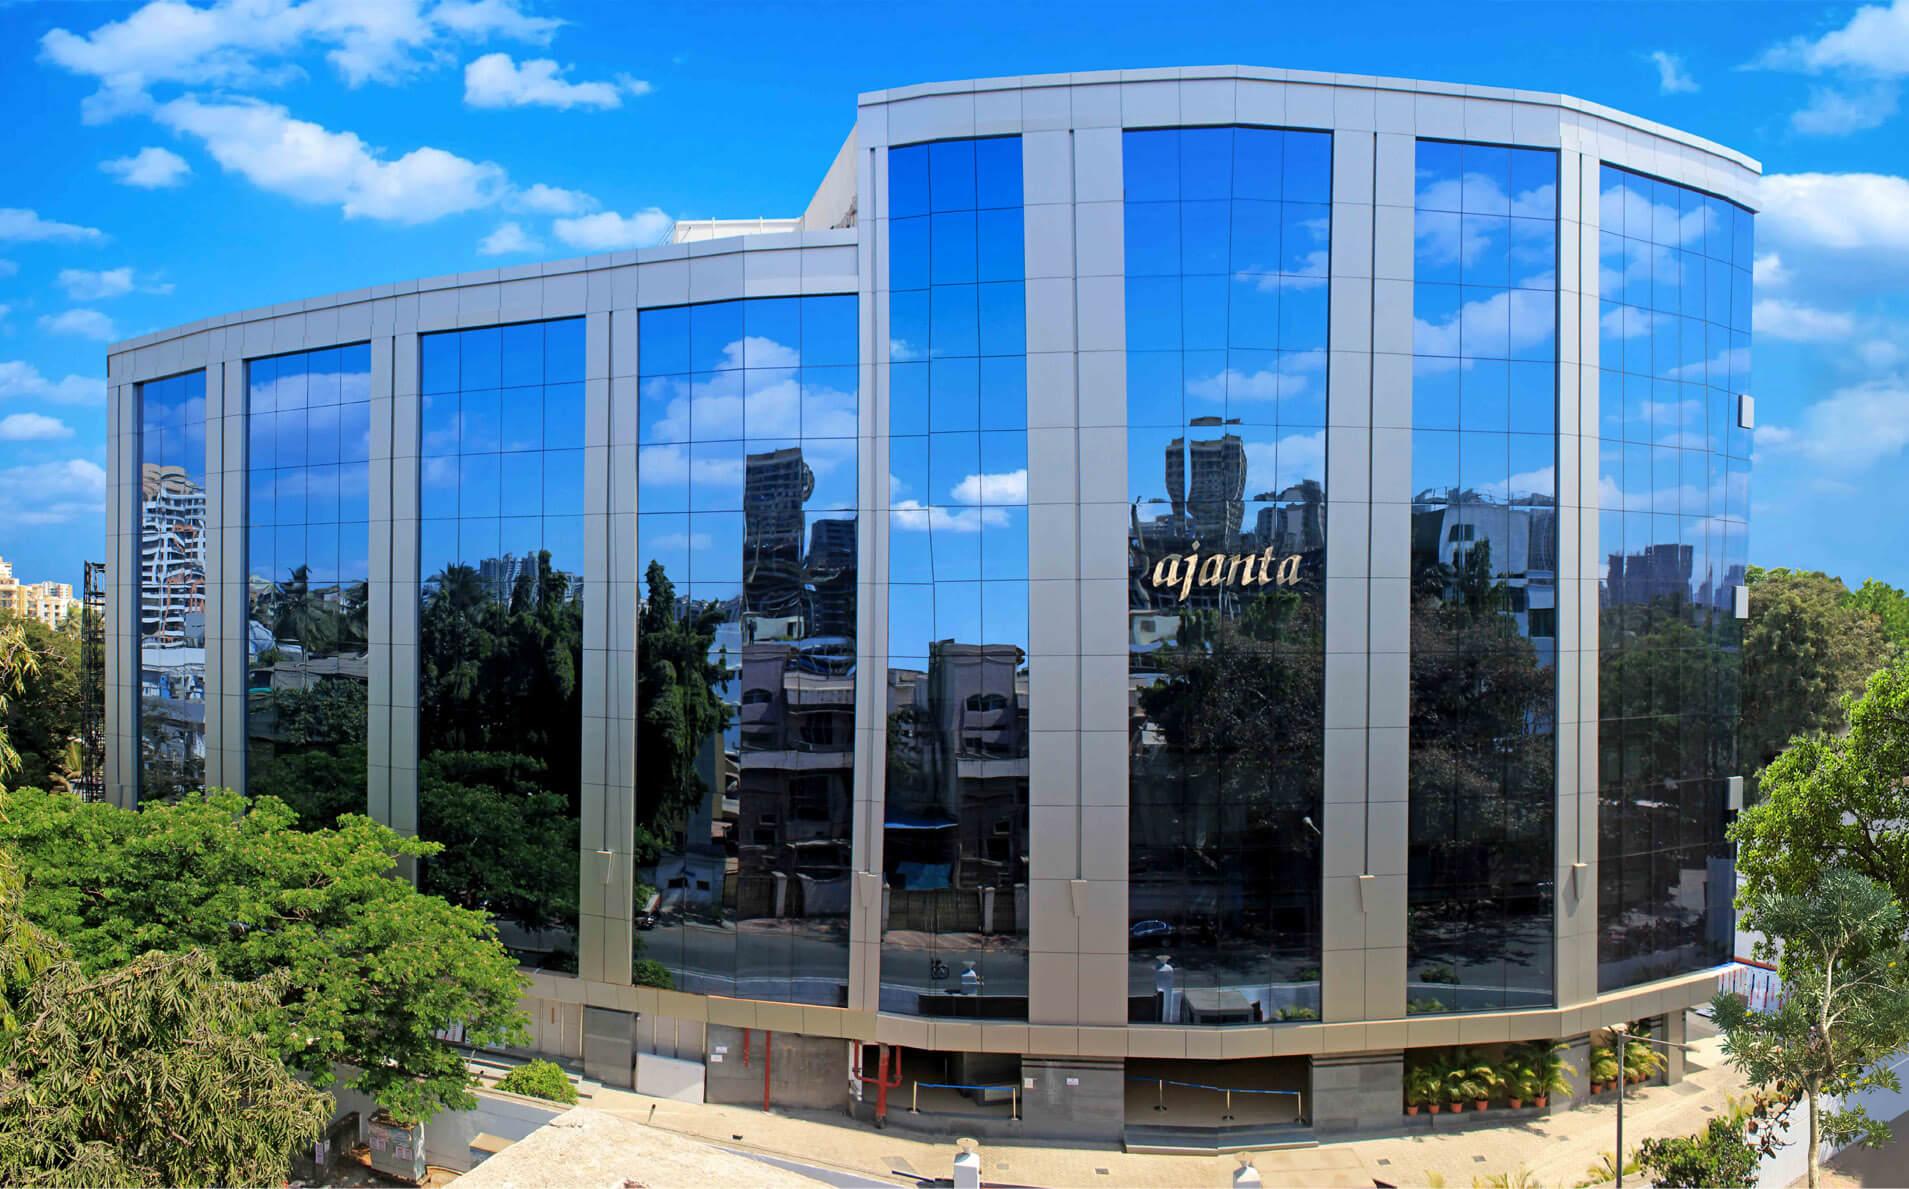 Ajanta Pharma Limited